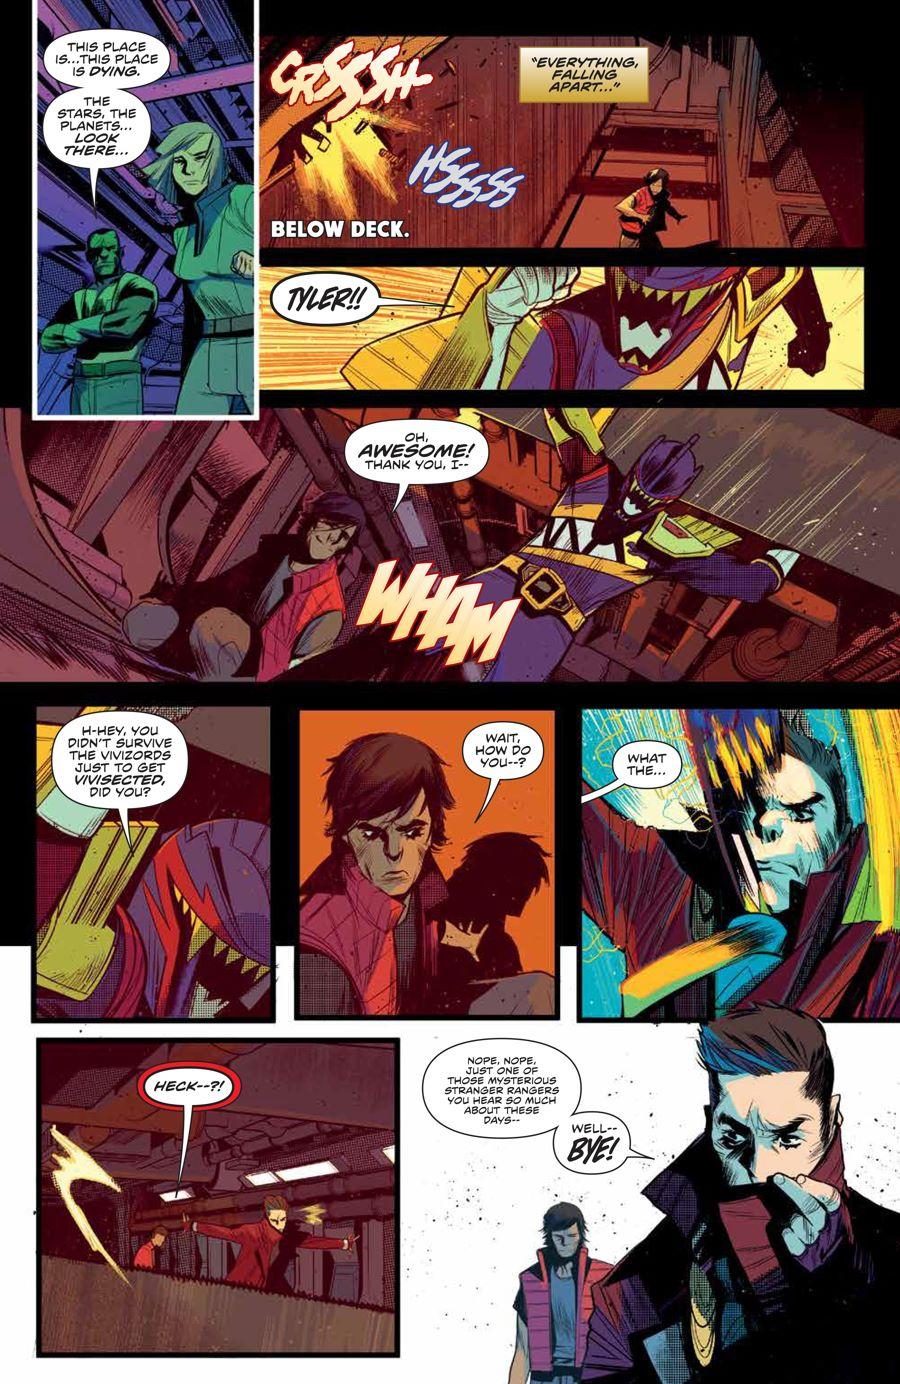 MMPR_BeyondGrid_SC_PRESS_14 ComicList Previews: MIGHTY MORPHIN POWER RANGERS BEYOND THE GRID TP